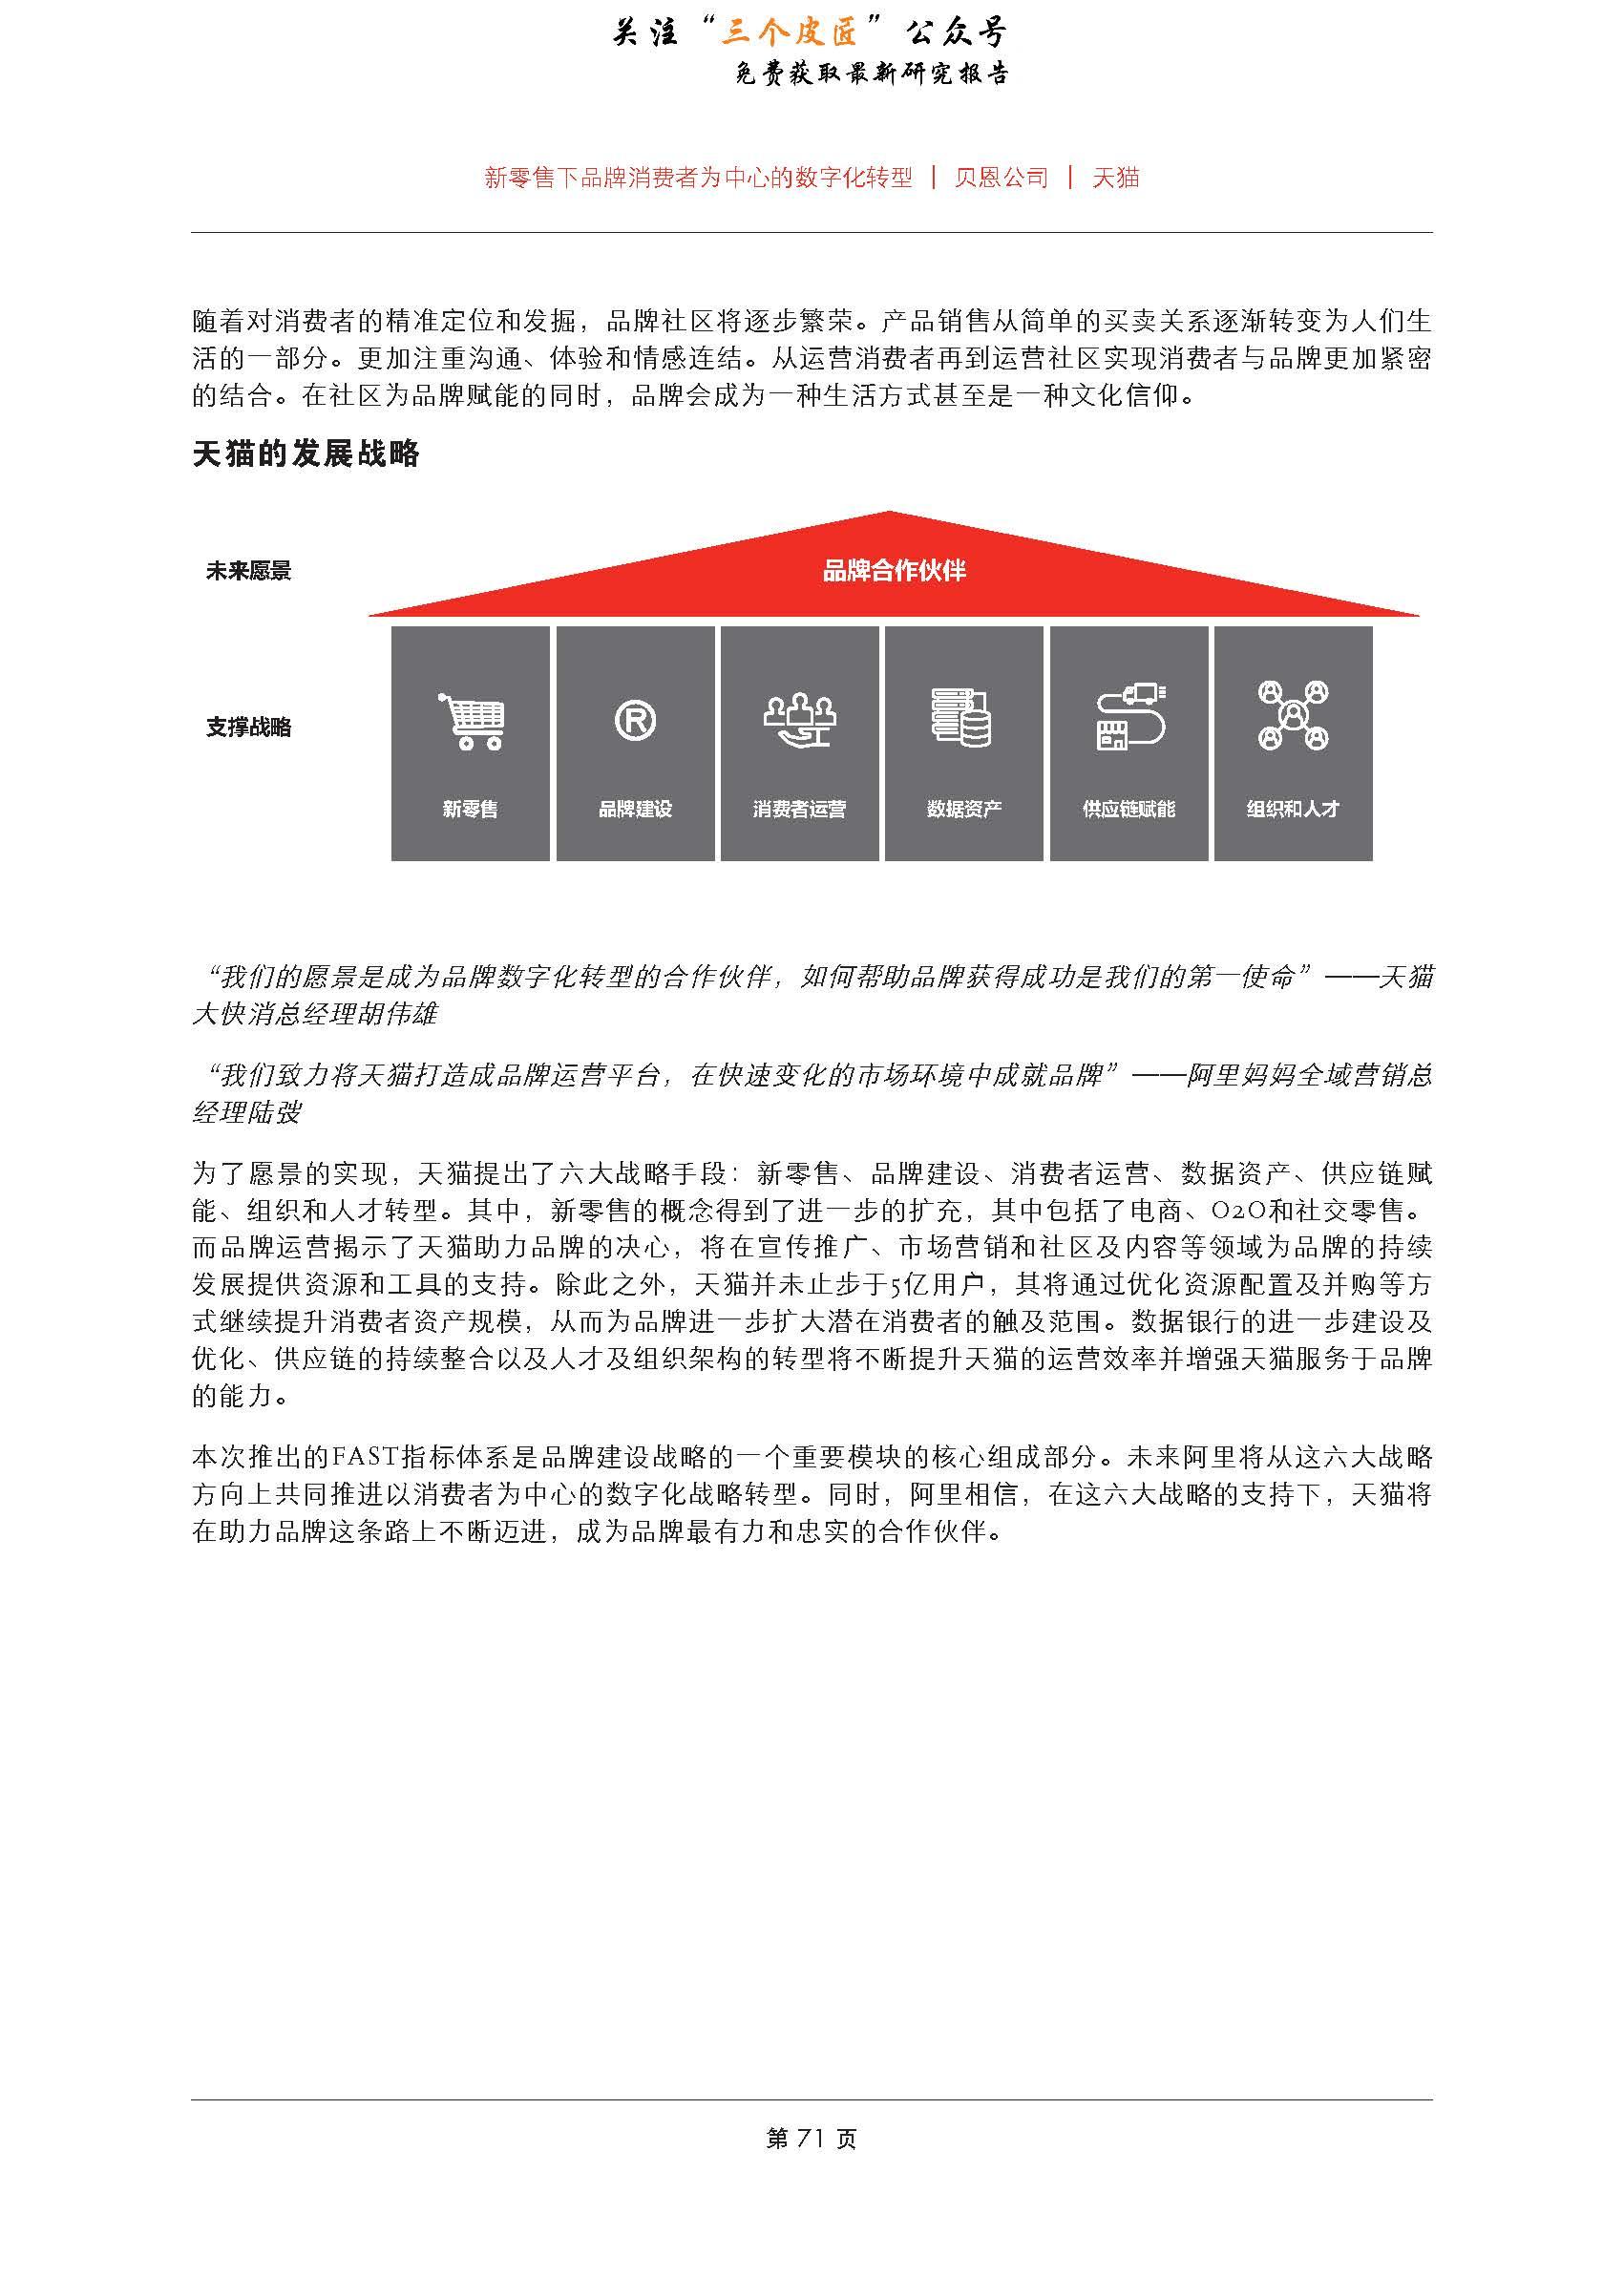 1_Page_73.jpg